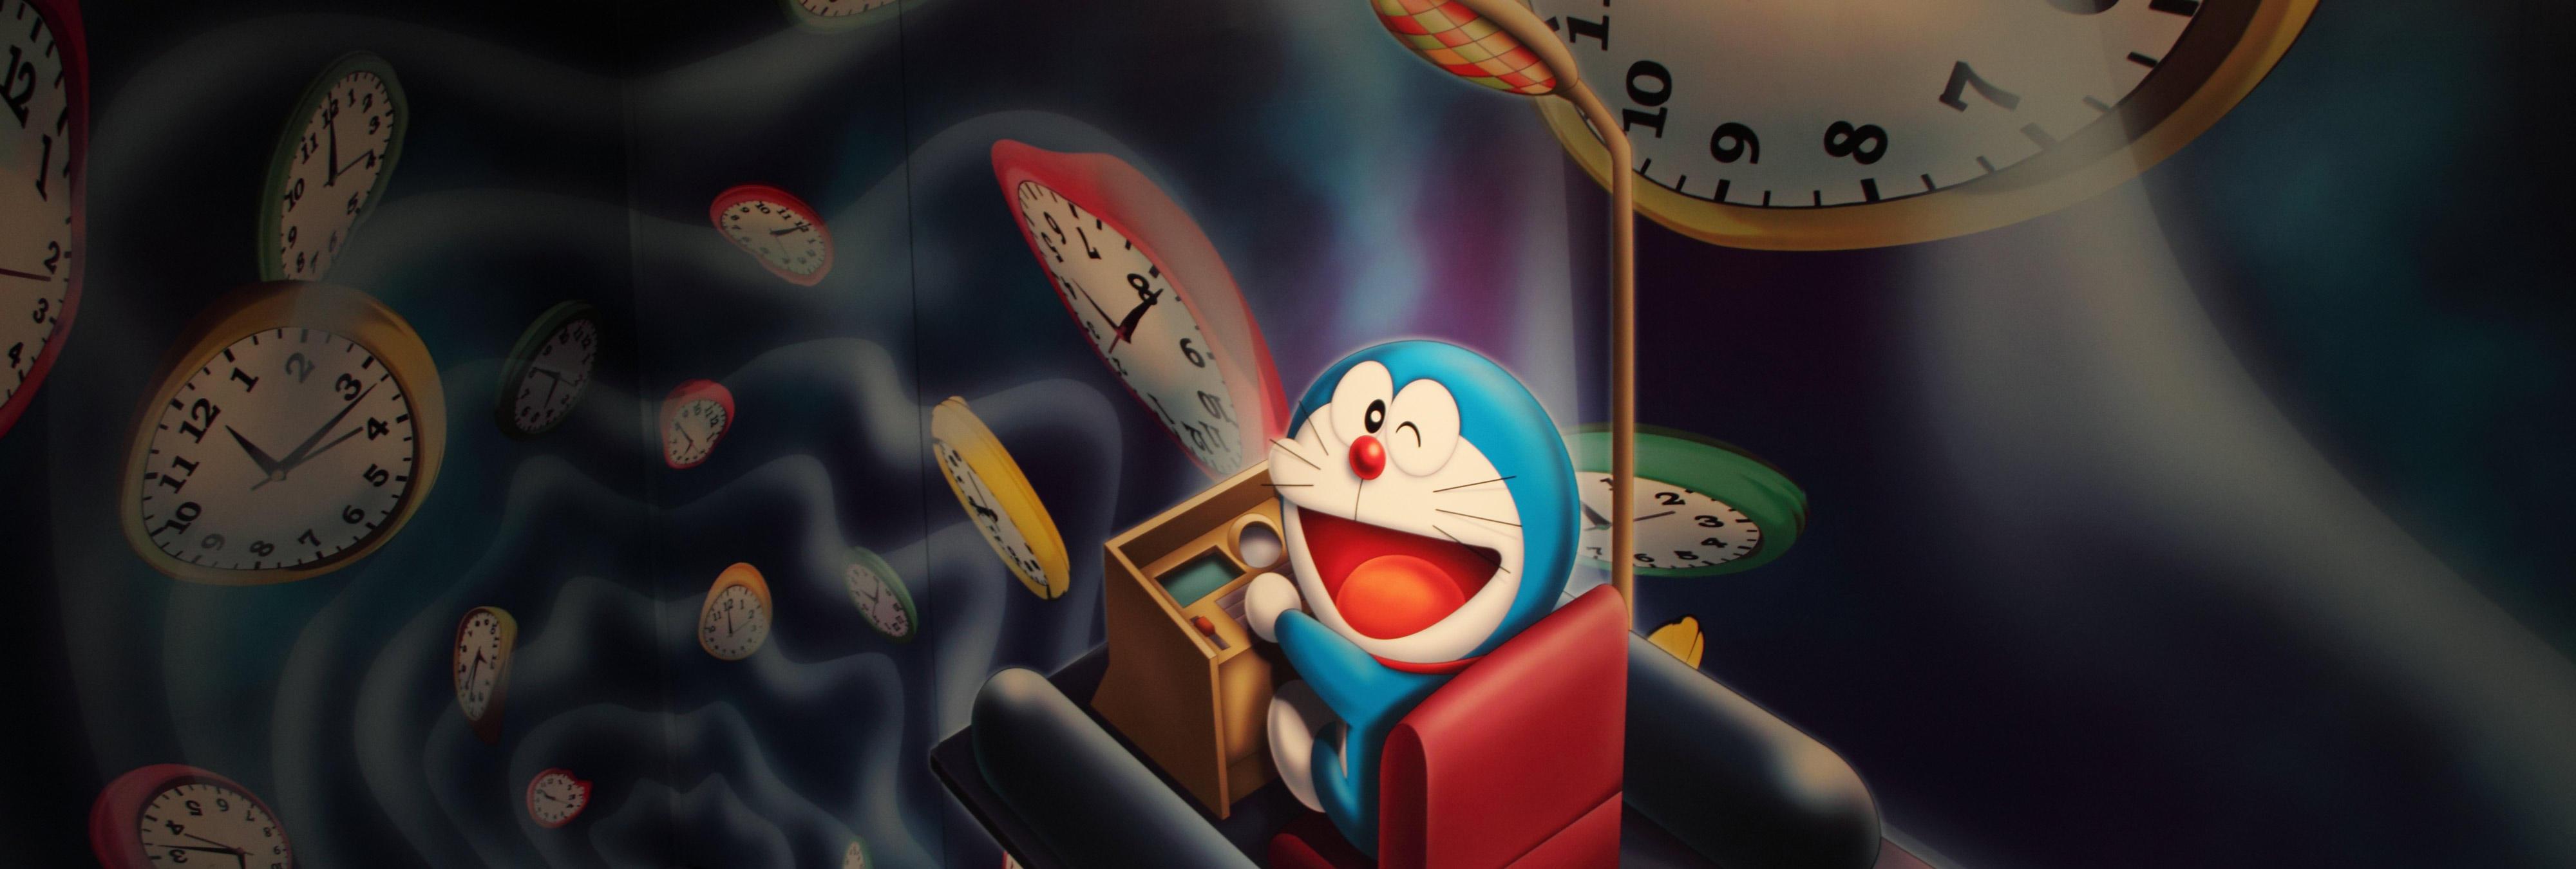 6 cosas que sabes de Japón gracias a Doraemon (aunque sea sin querer)